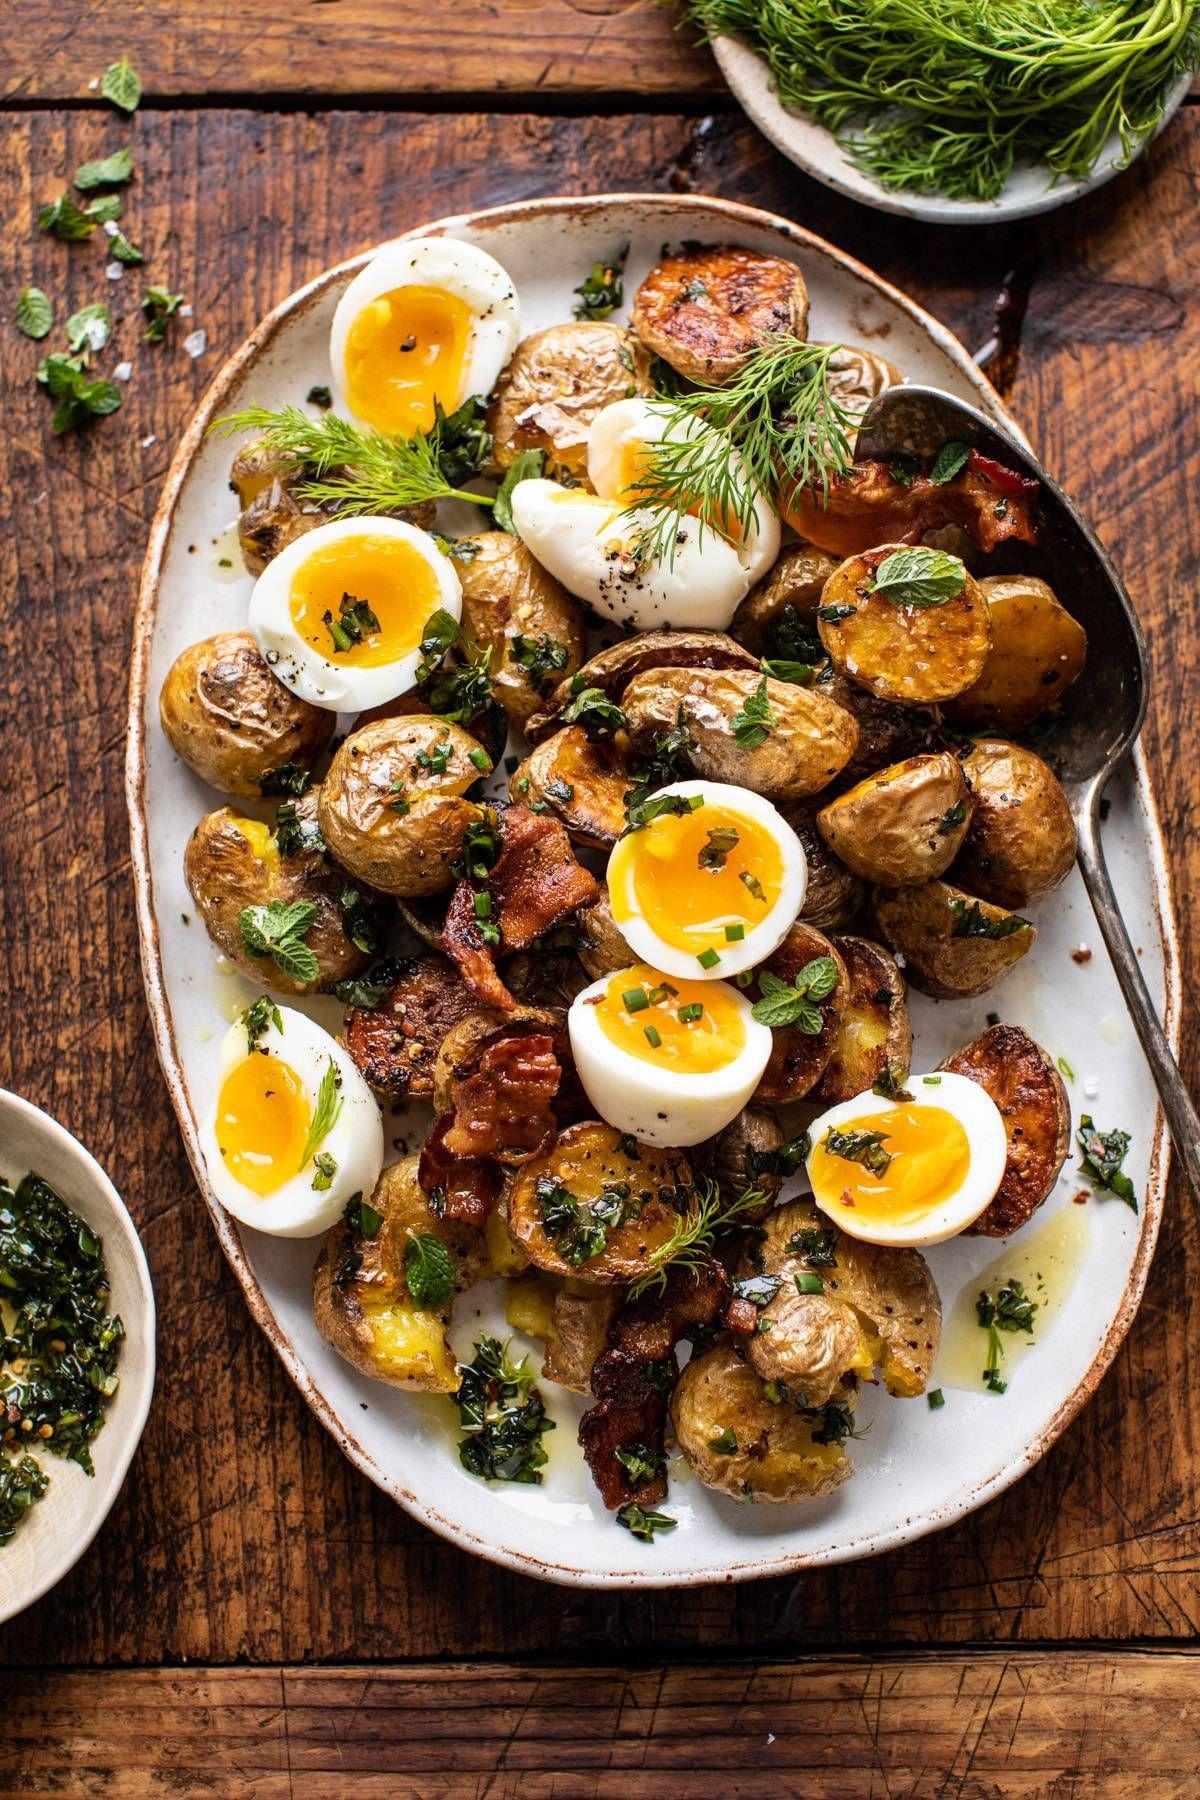 Crispy Breakfast Potatoes with Chili Garlic Oil and Herbs | halfbakedharvest.com #potatoes #breakfast #easyrecipes #brunch